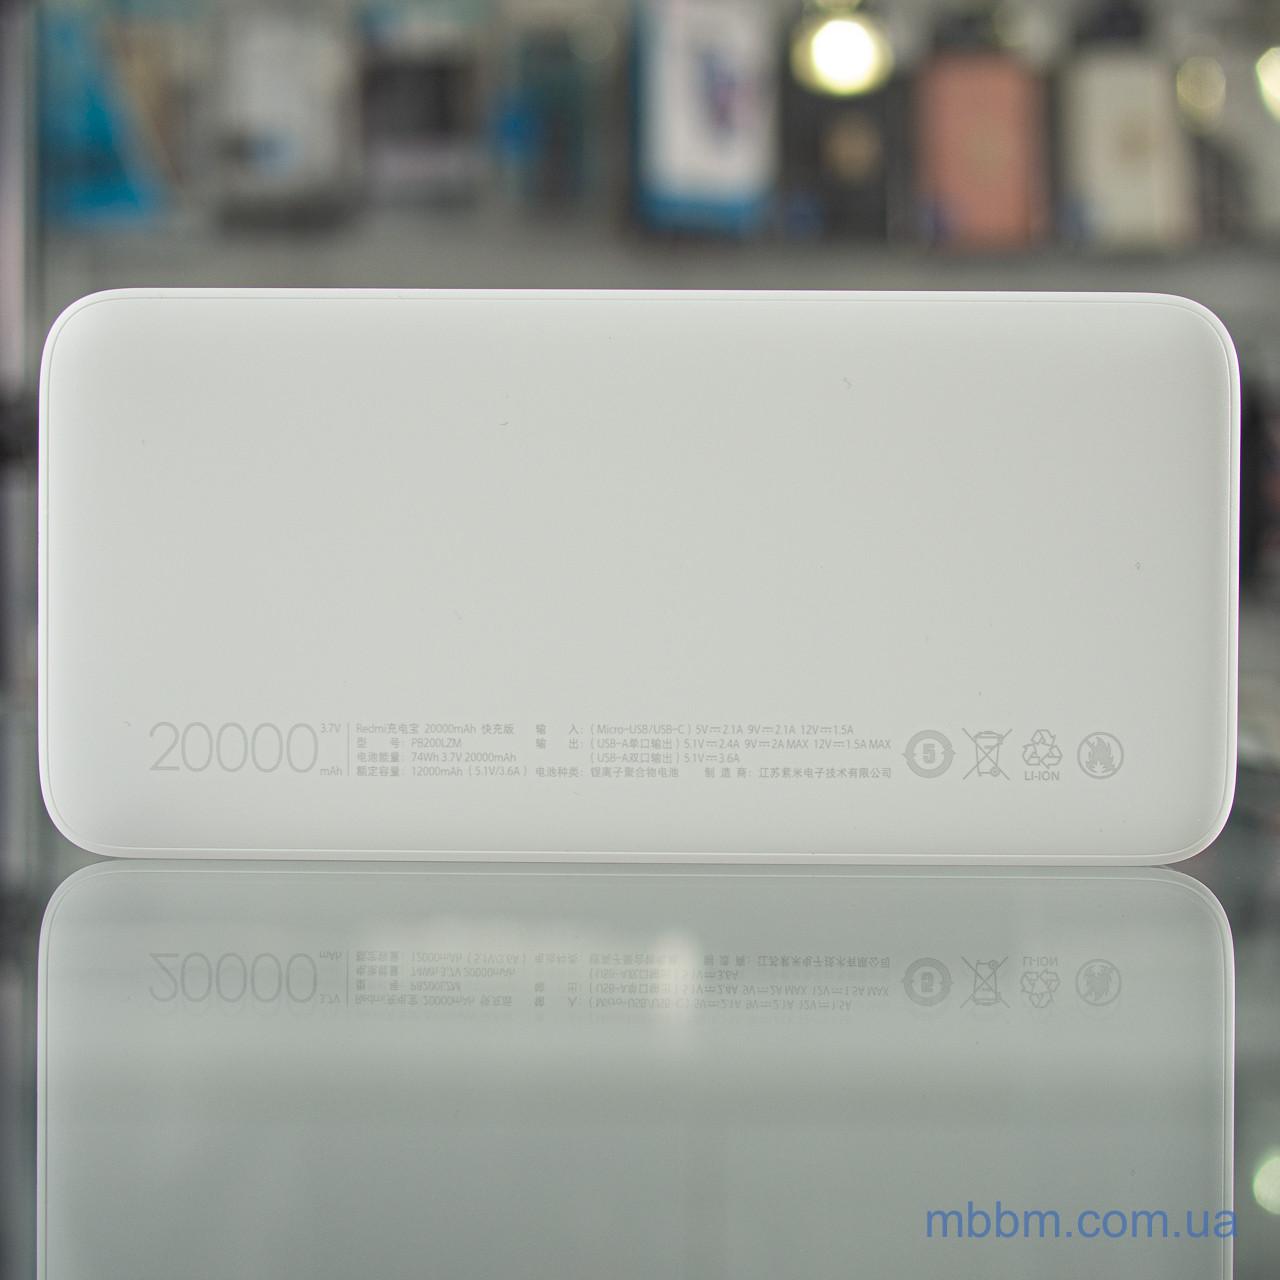 Портативная батарея Xiaomi Redmi 20000mAh White Белый